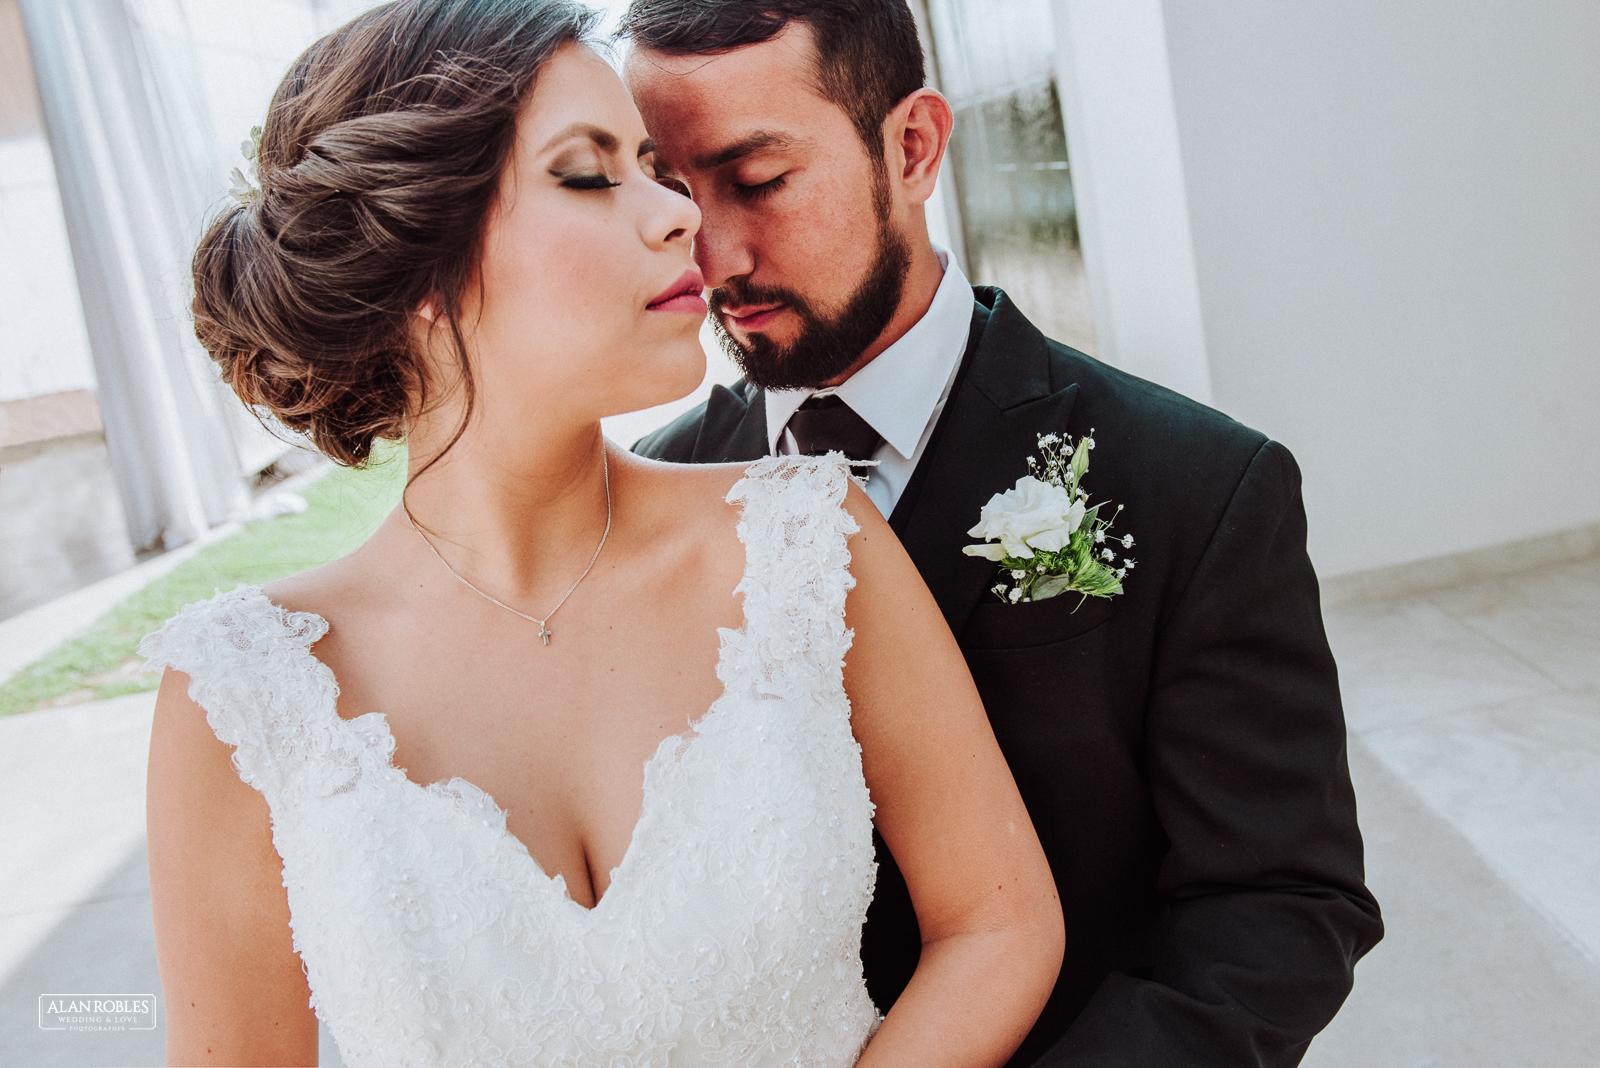 Fotografo de bodas Alan Robles-Boda en Guadalajara Real San Javier-40